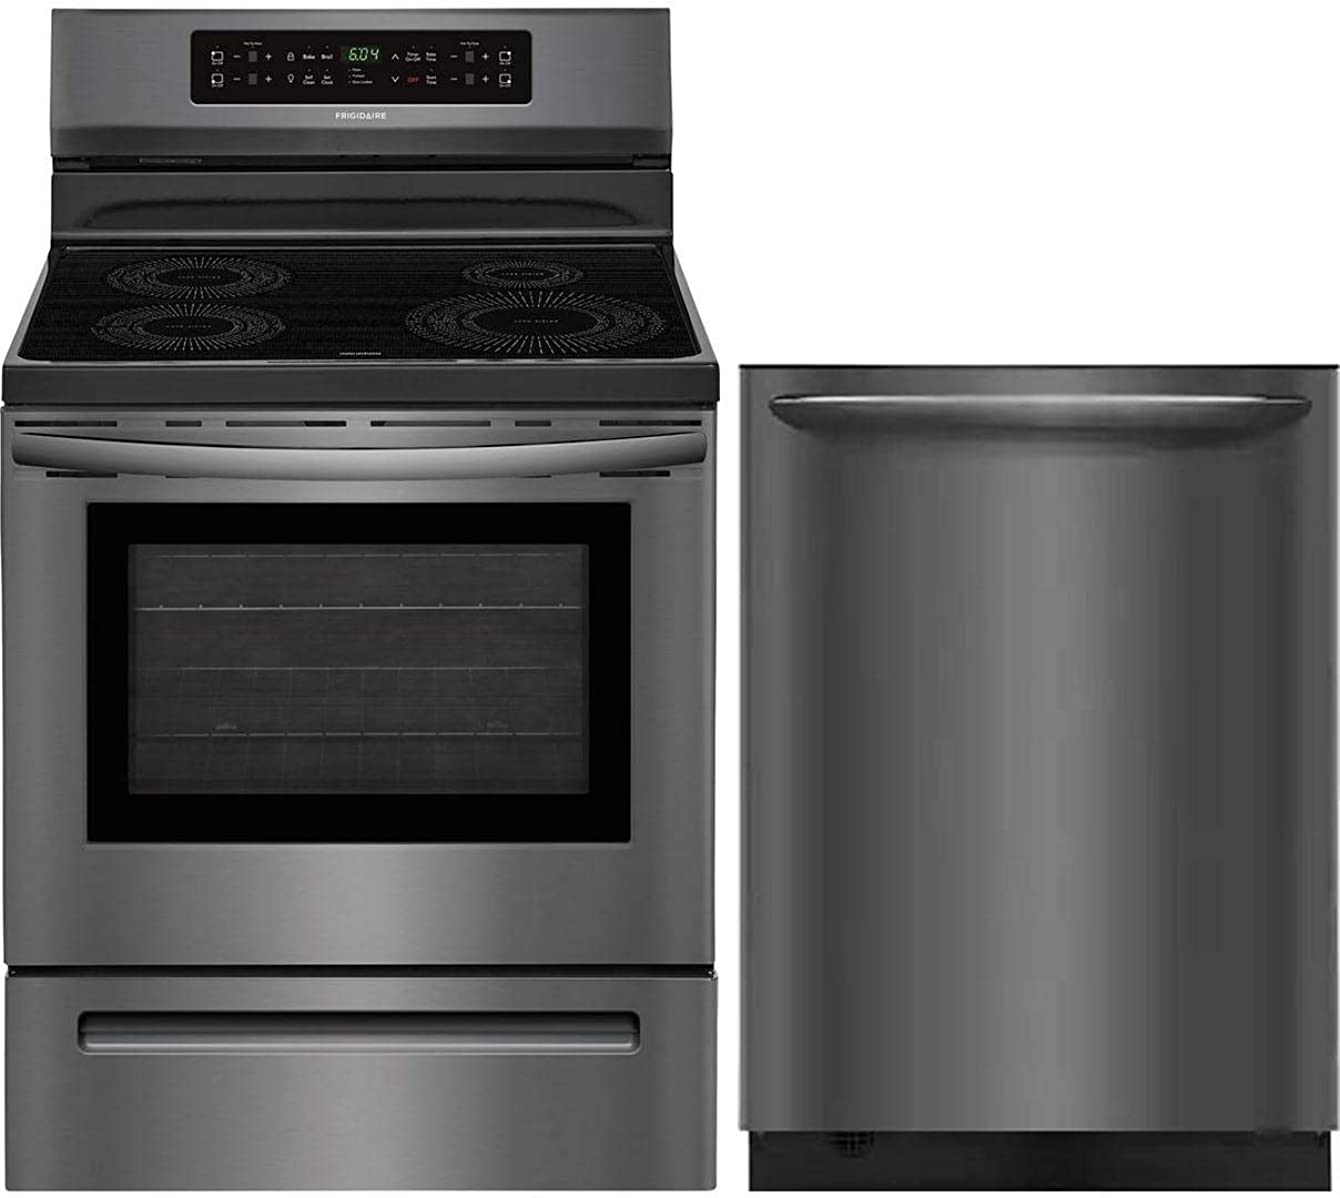 Frigidaire 2 Piece Kitchen Appliance Package with FFIF3054TD 30